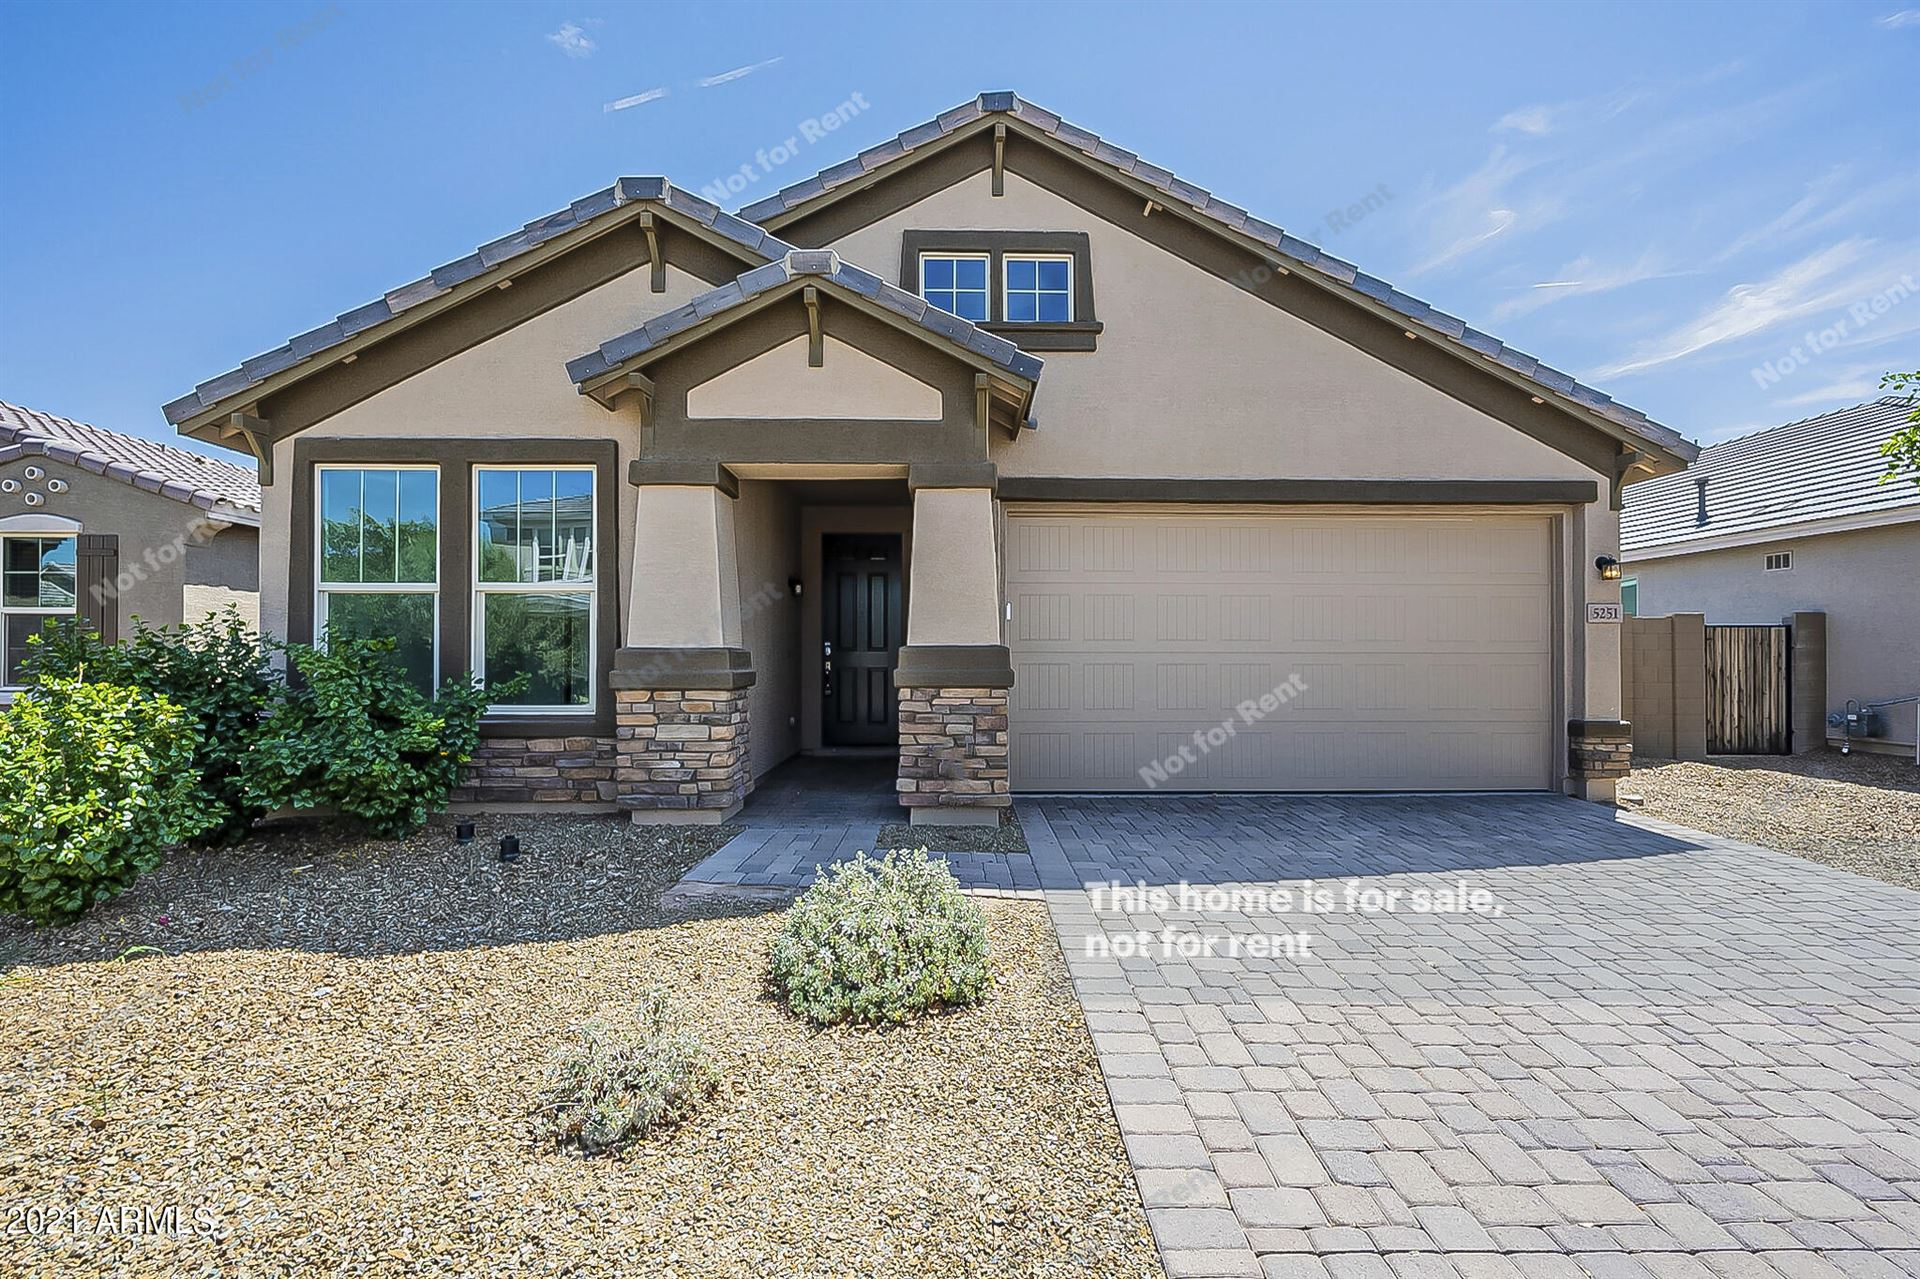 Photo of 5251 W LEODRA Lane, Laveen, AZ 85339 (MLS # 6293066)